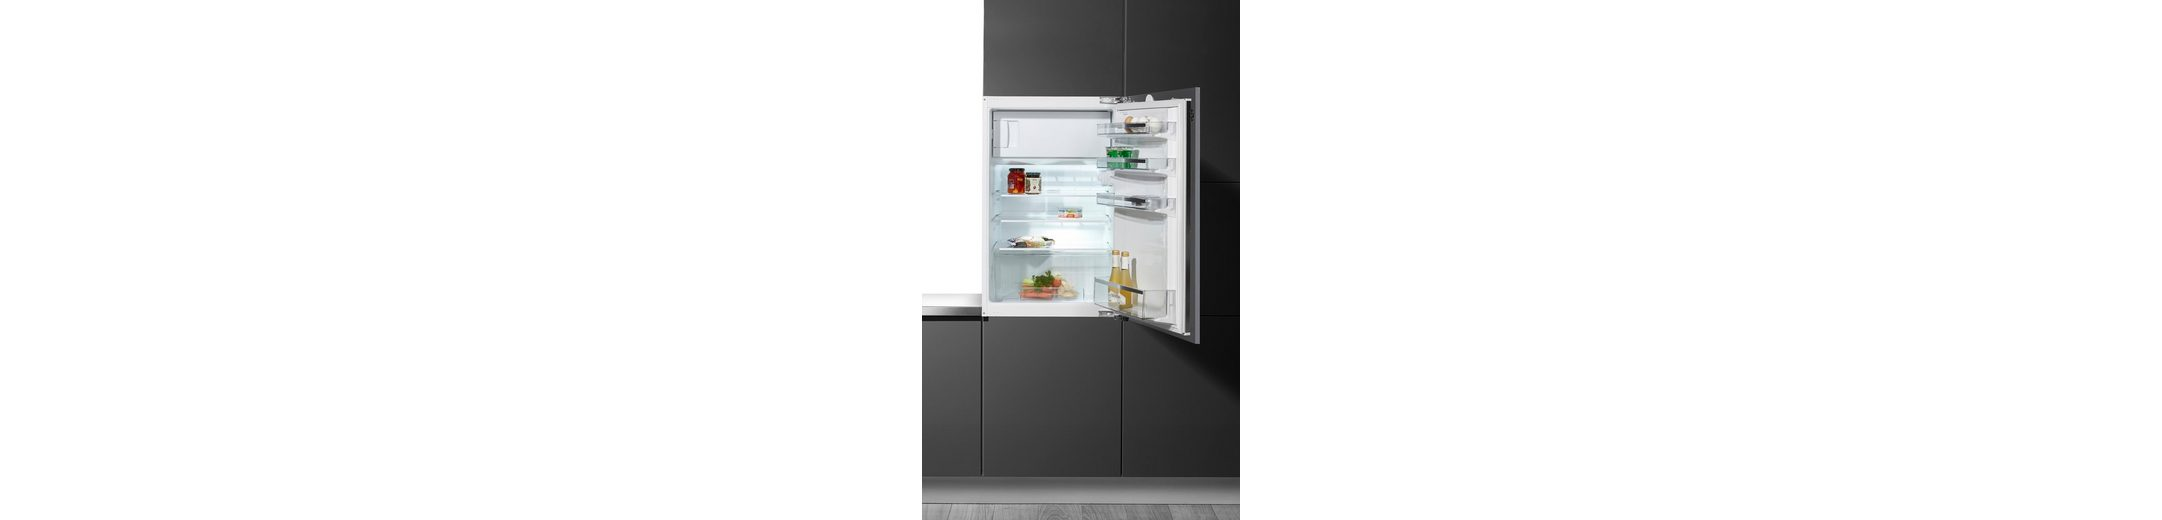 Siemens integrierbarer Einbaukühlschrank »KI18LV51«, A+, 88 cm